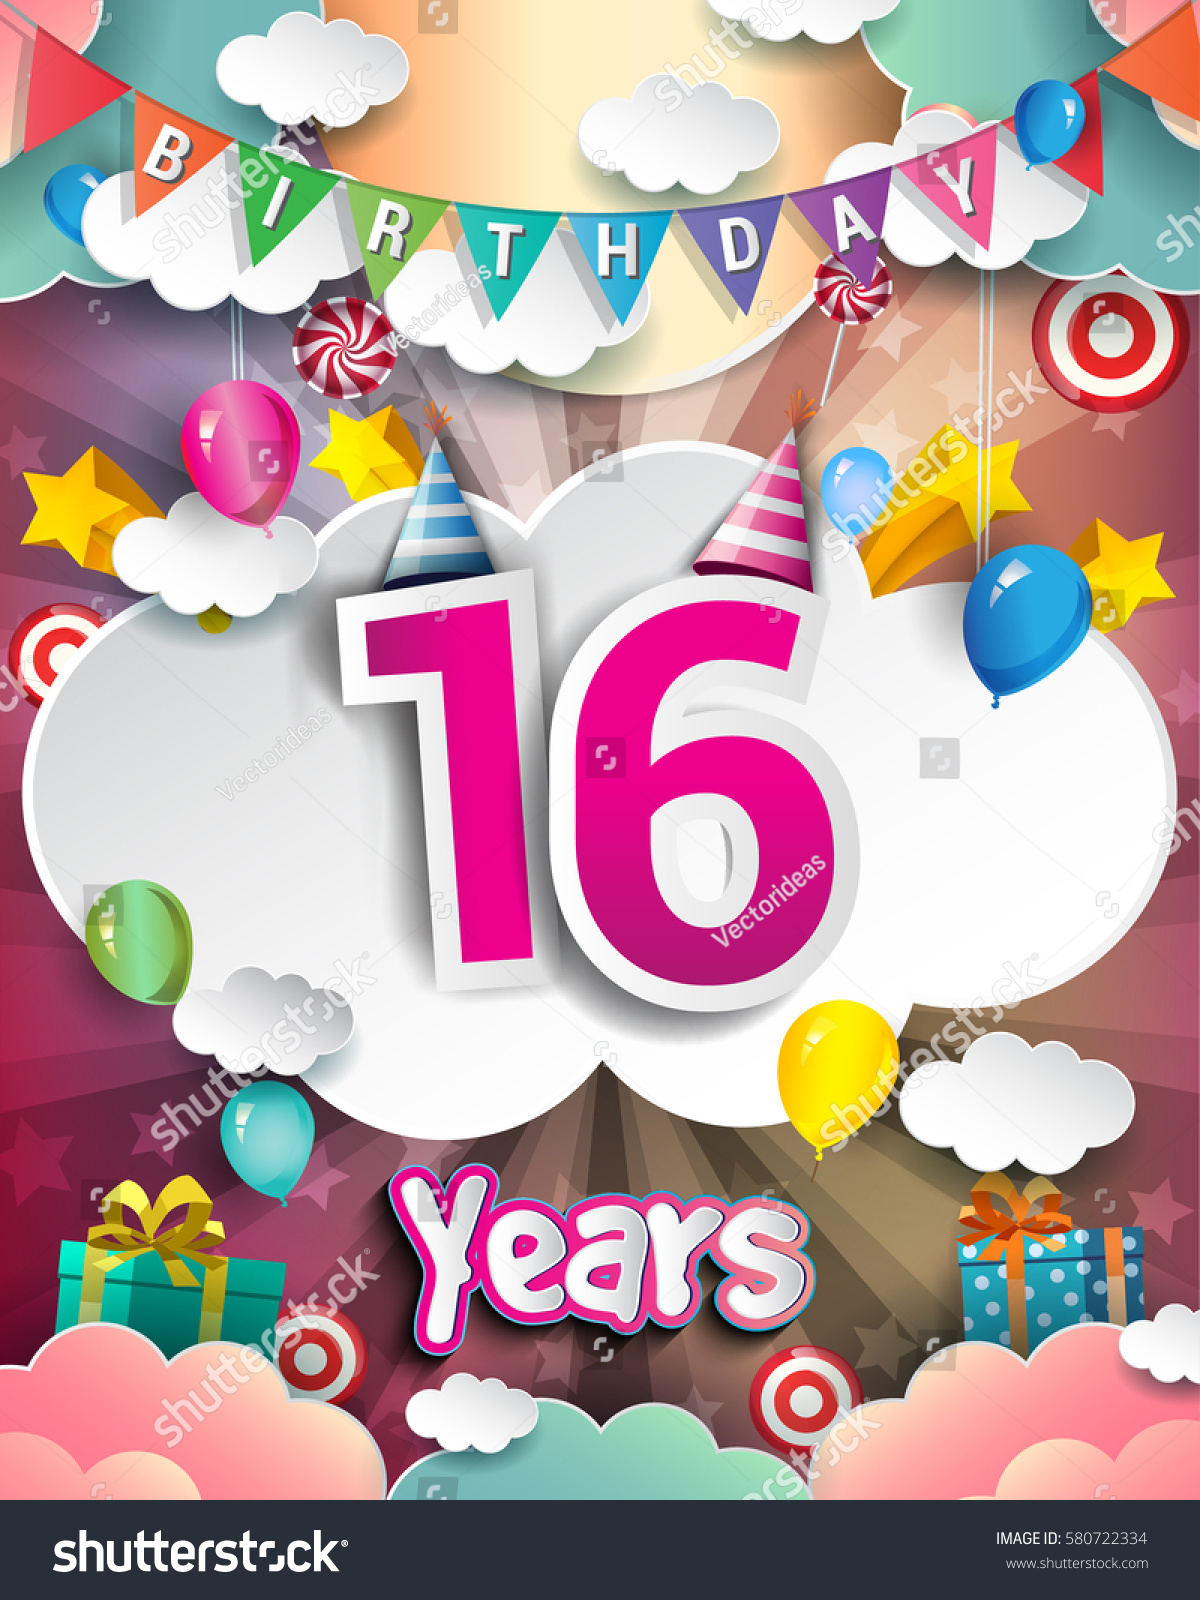 16th birthday celebration greeting card design stock vector royalty 16th birthday celebration greeting card design with clouds and balloons vector elements for the m4hsunfo